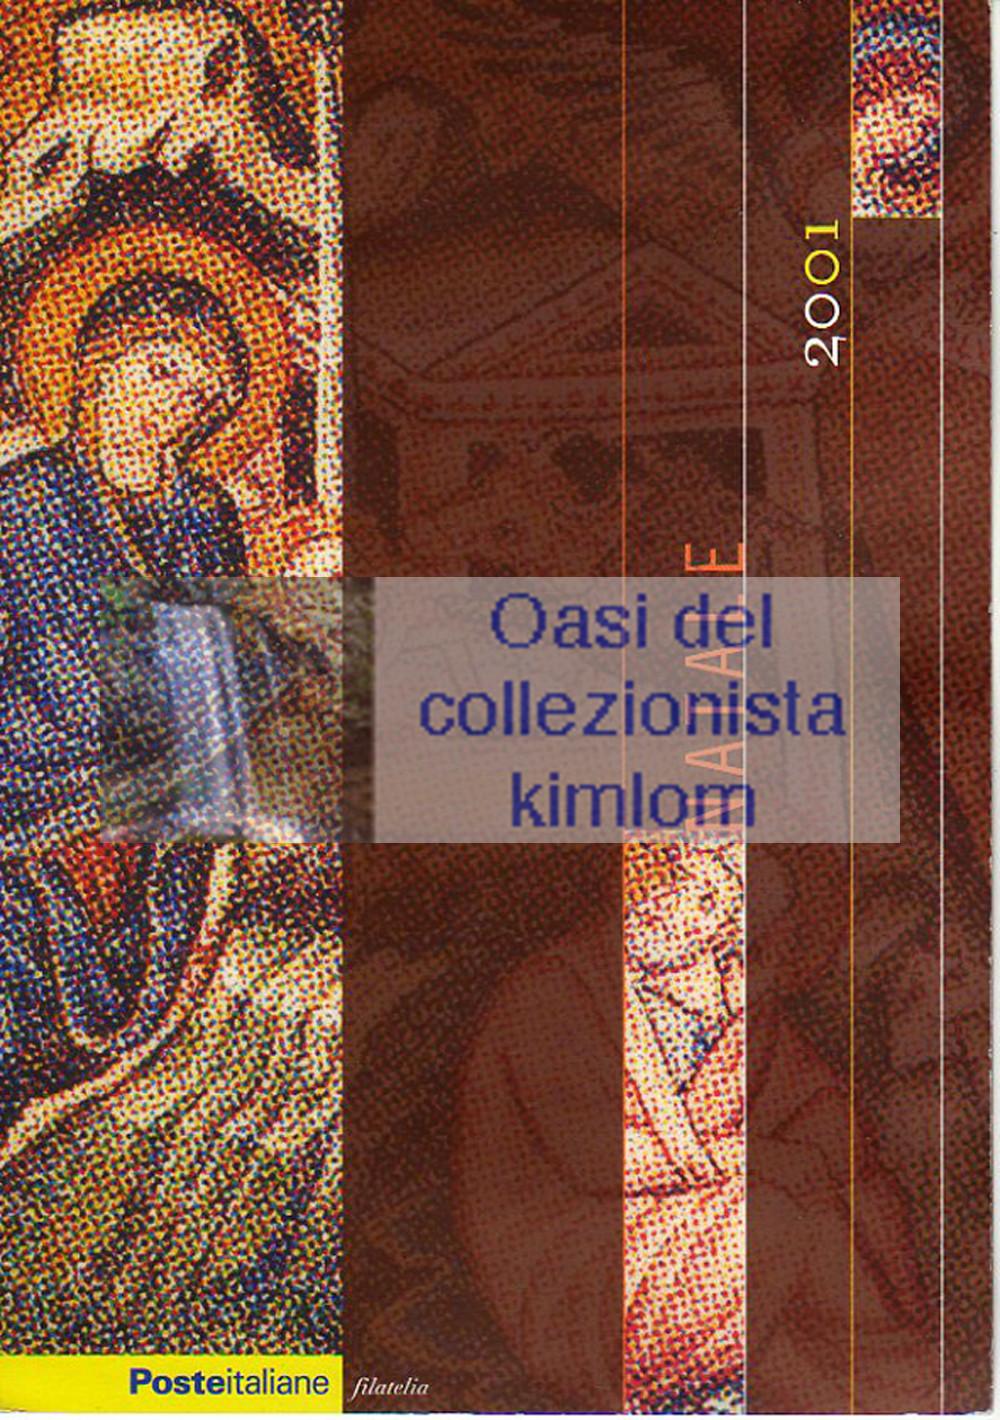 folder - Natale 2001